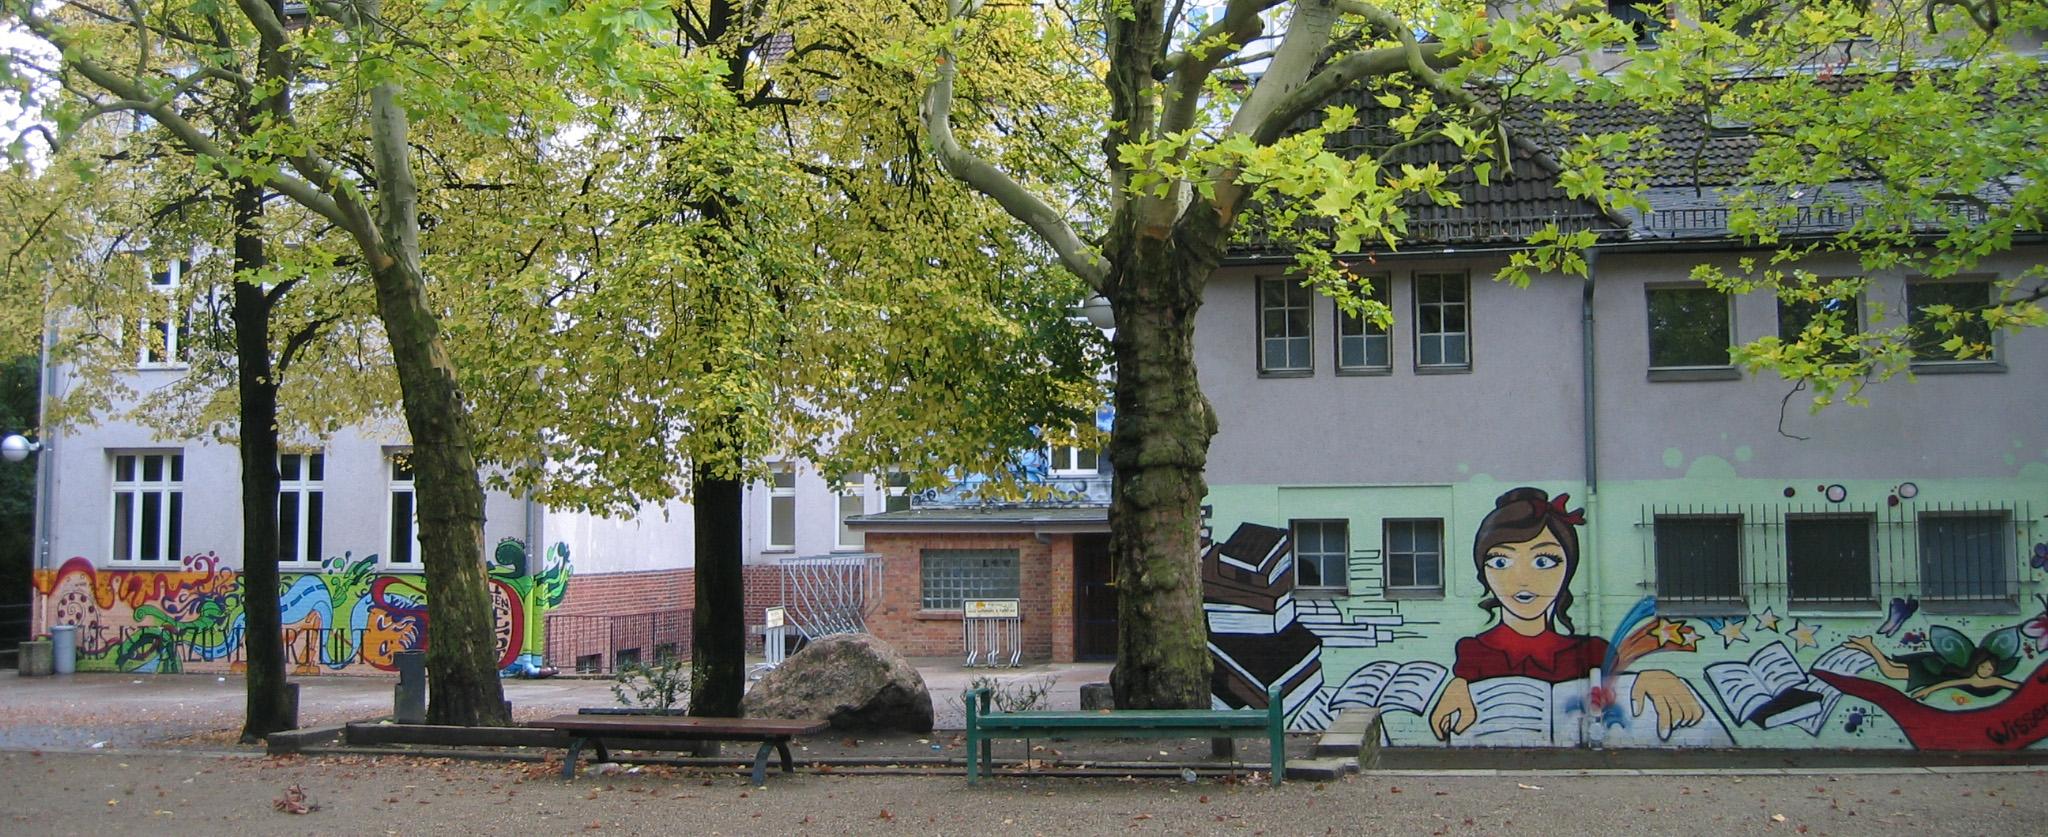 Das ONG | Otto-Nagel-Gymnasium